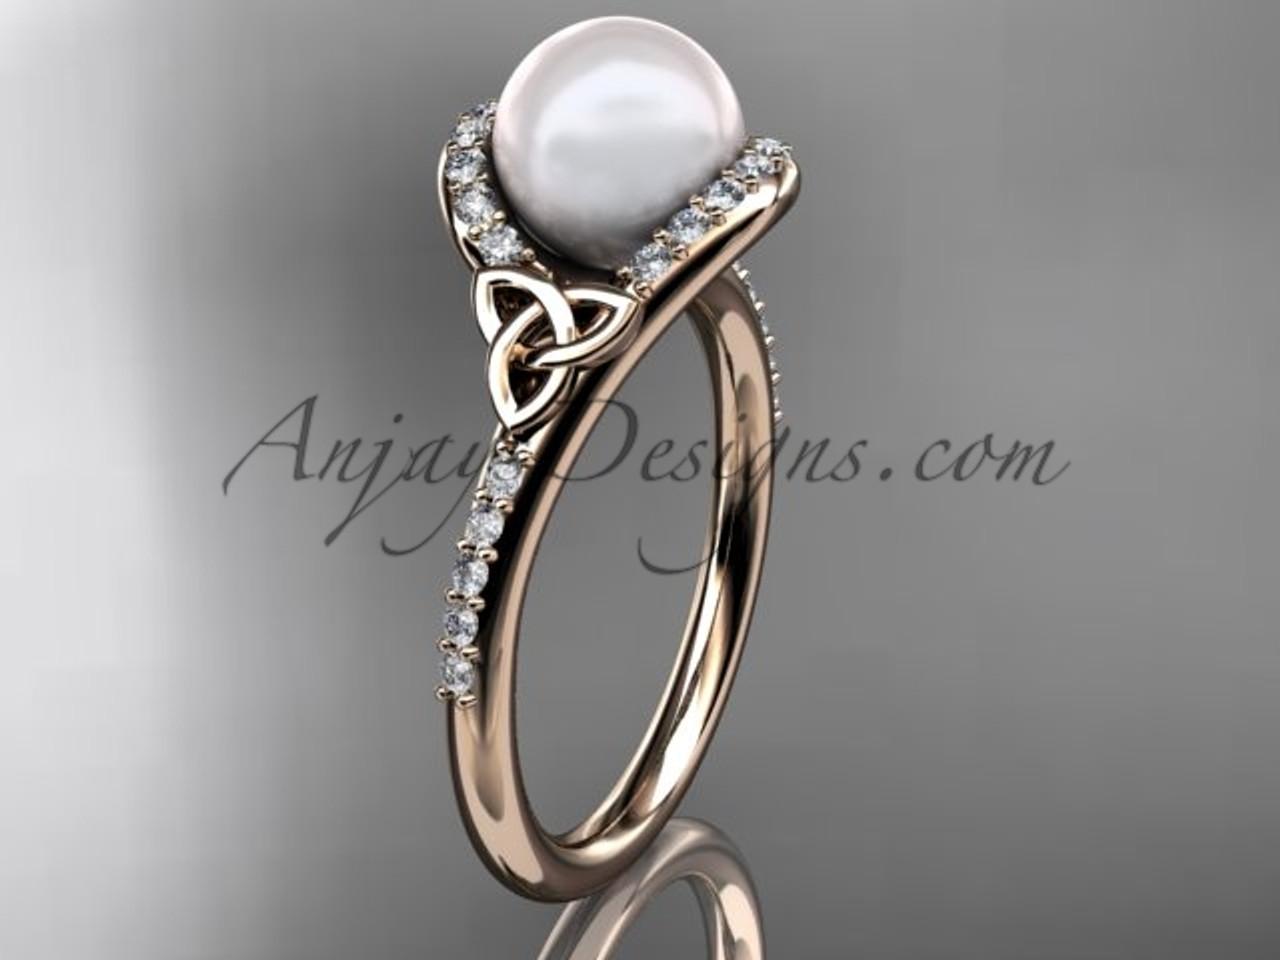 Pearl Wedding Rings.Irish Pearl Engagement Rings 14kt Rose Gold Diamond Celtic Trinity Knot Wedding Ring Ctp7317